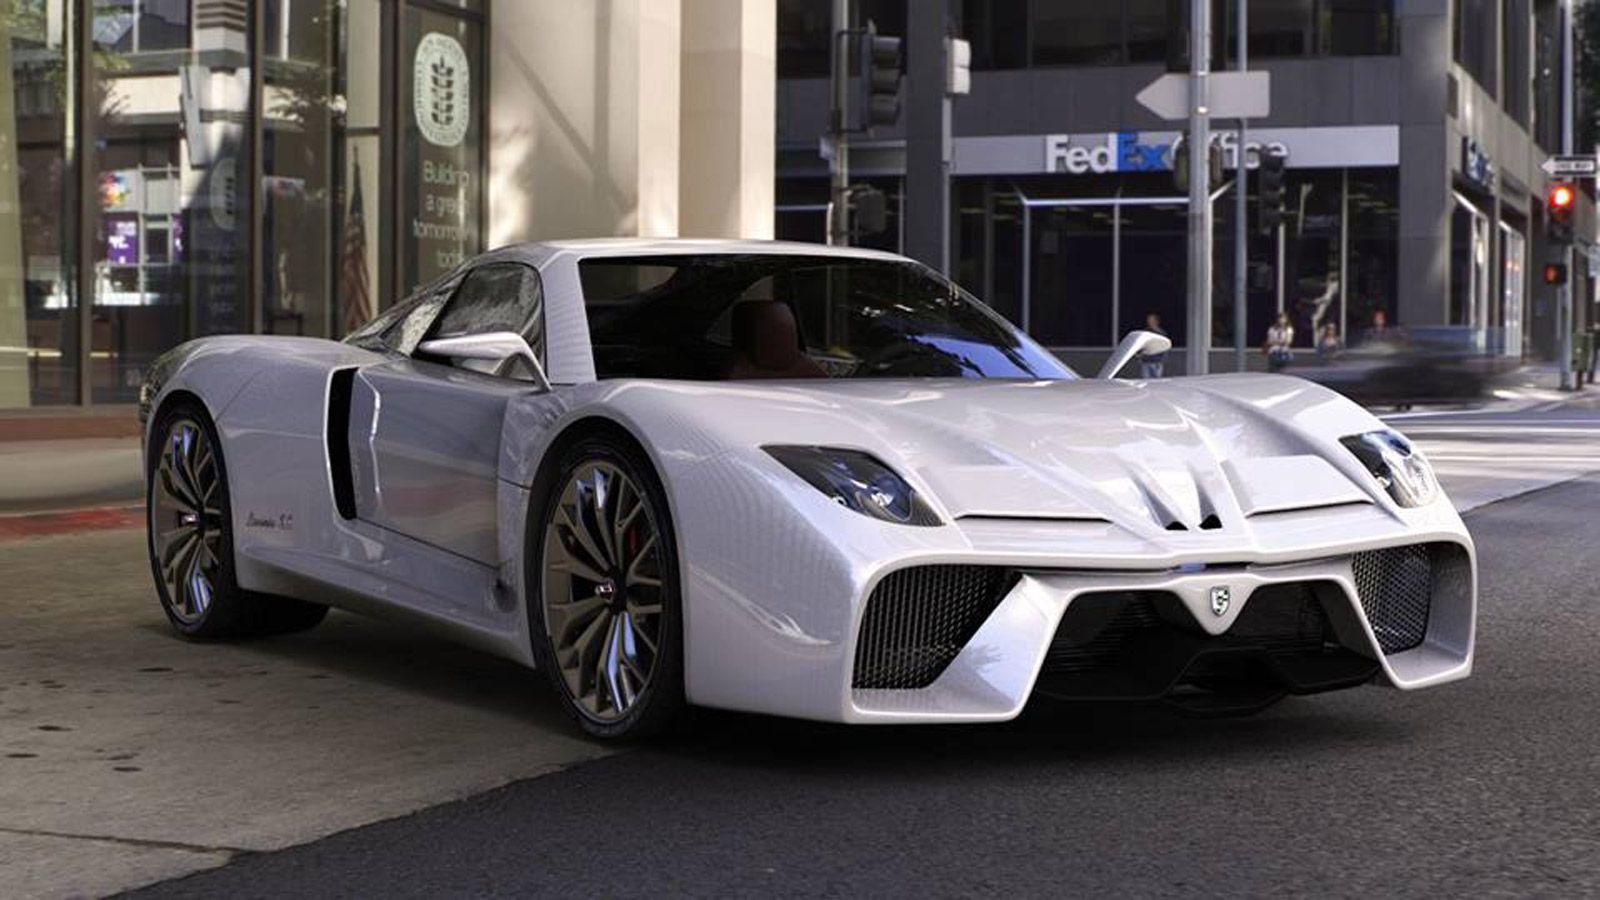 Italian Firm Plans Electric Supercar Super Cars Electric Cars Car